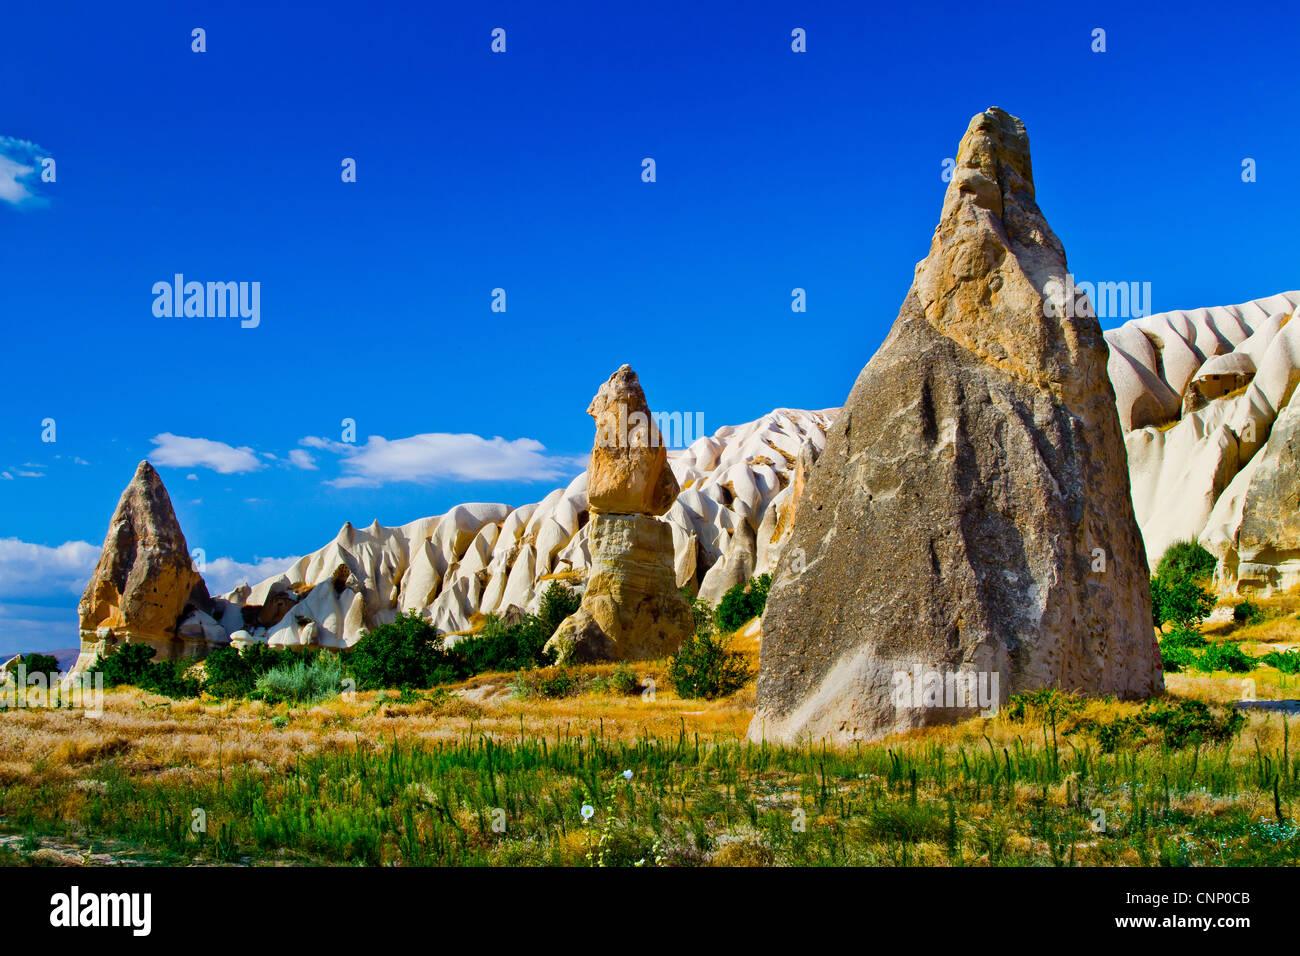 Cappadocia Region. Nevsehir province. Turkey - Stock Image